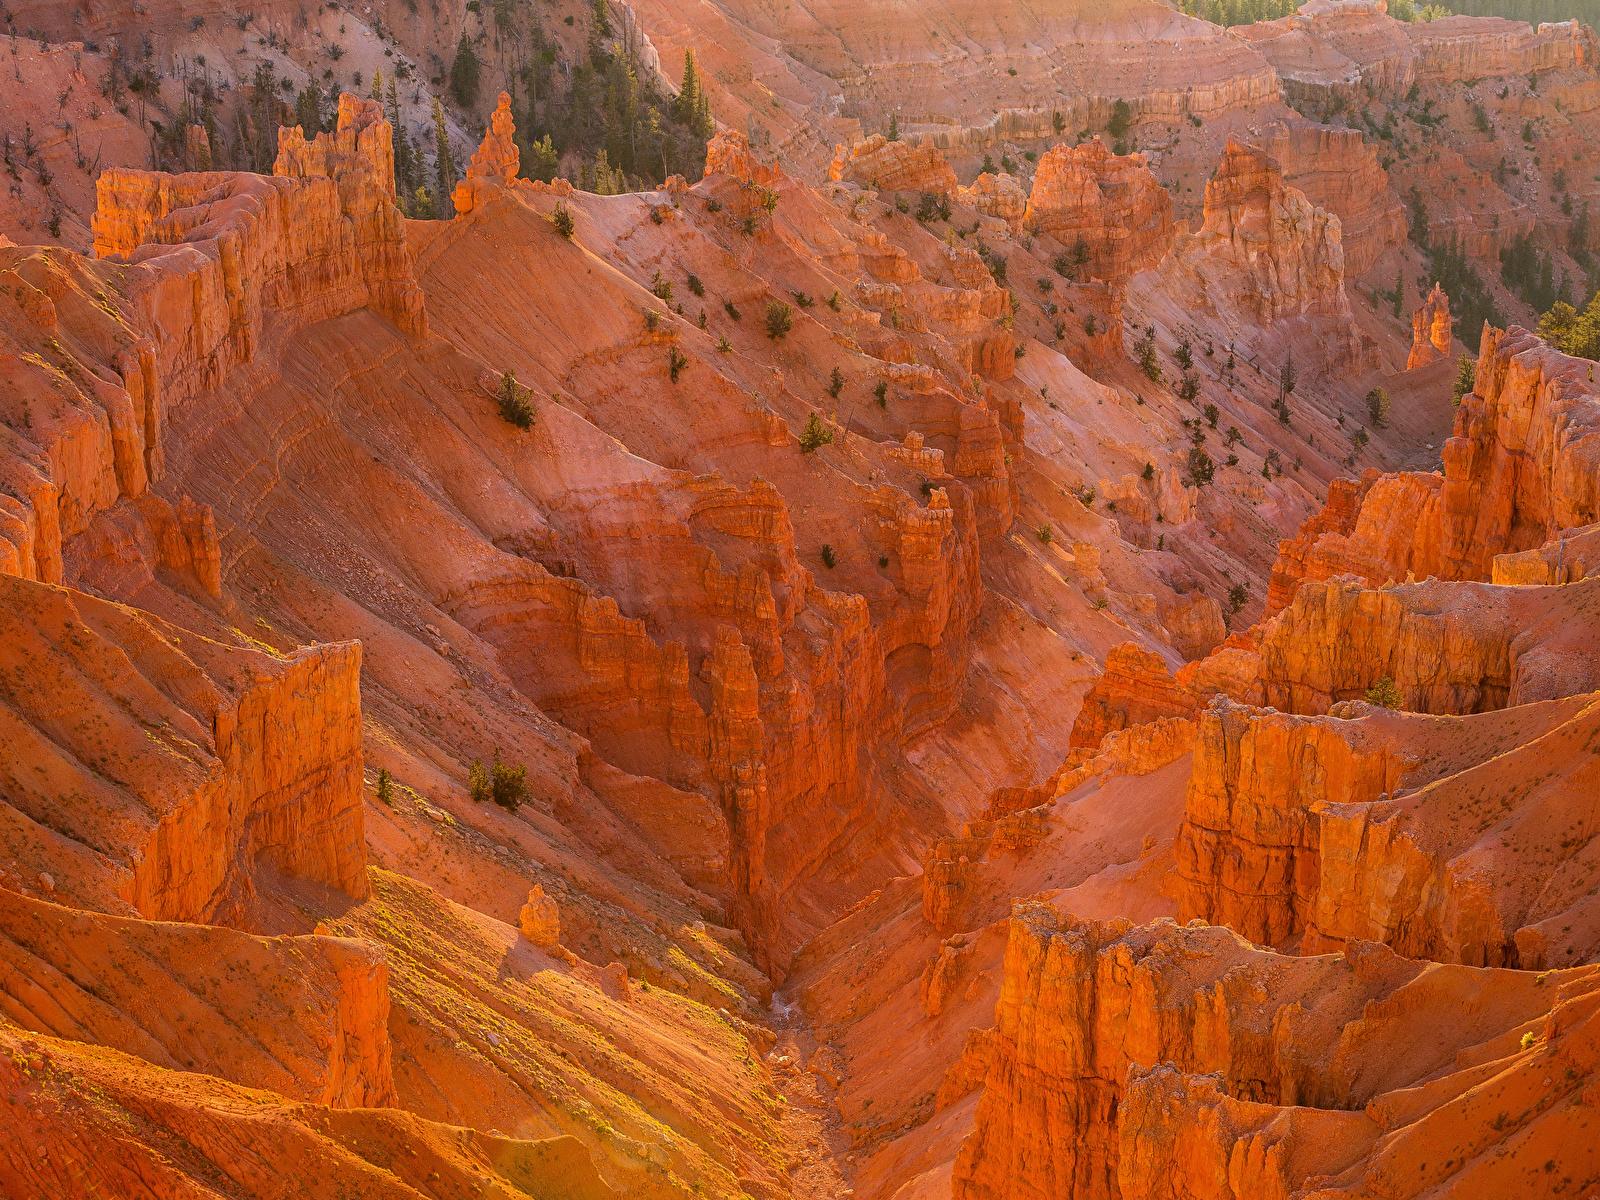 Картинка штаты Cedar Breaks National Monument Горы Природа парк 1600x1200 США америка гора Парки